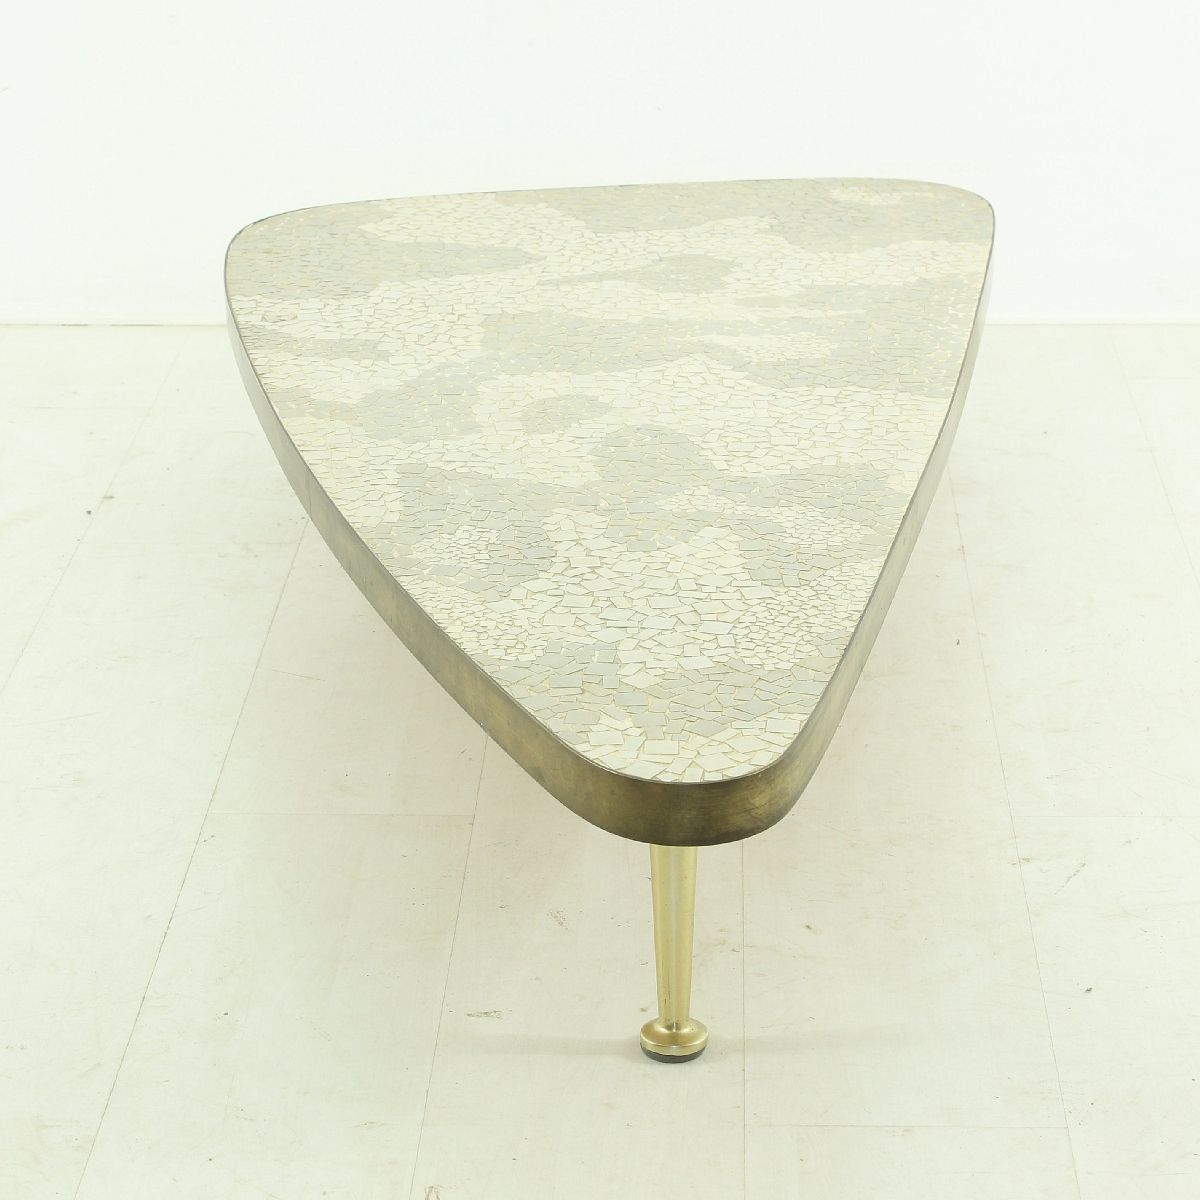 table basse vintage blanche et grise 1950s en vente sur. Black Bedroom Furniture Sets. Home Design Ideas